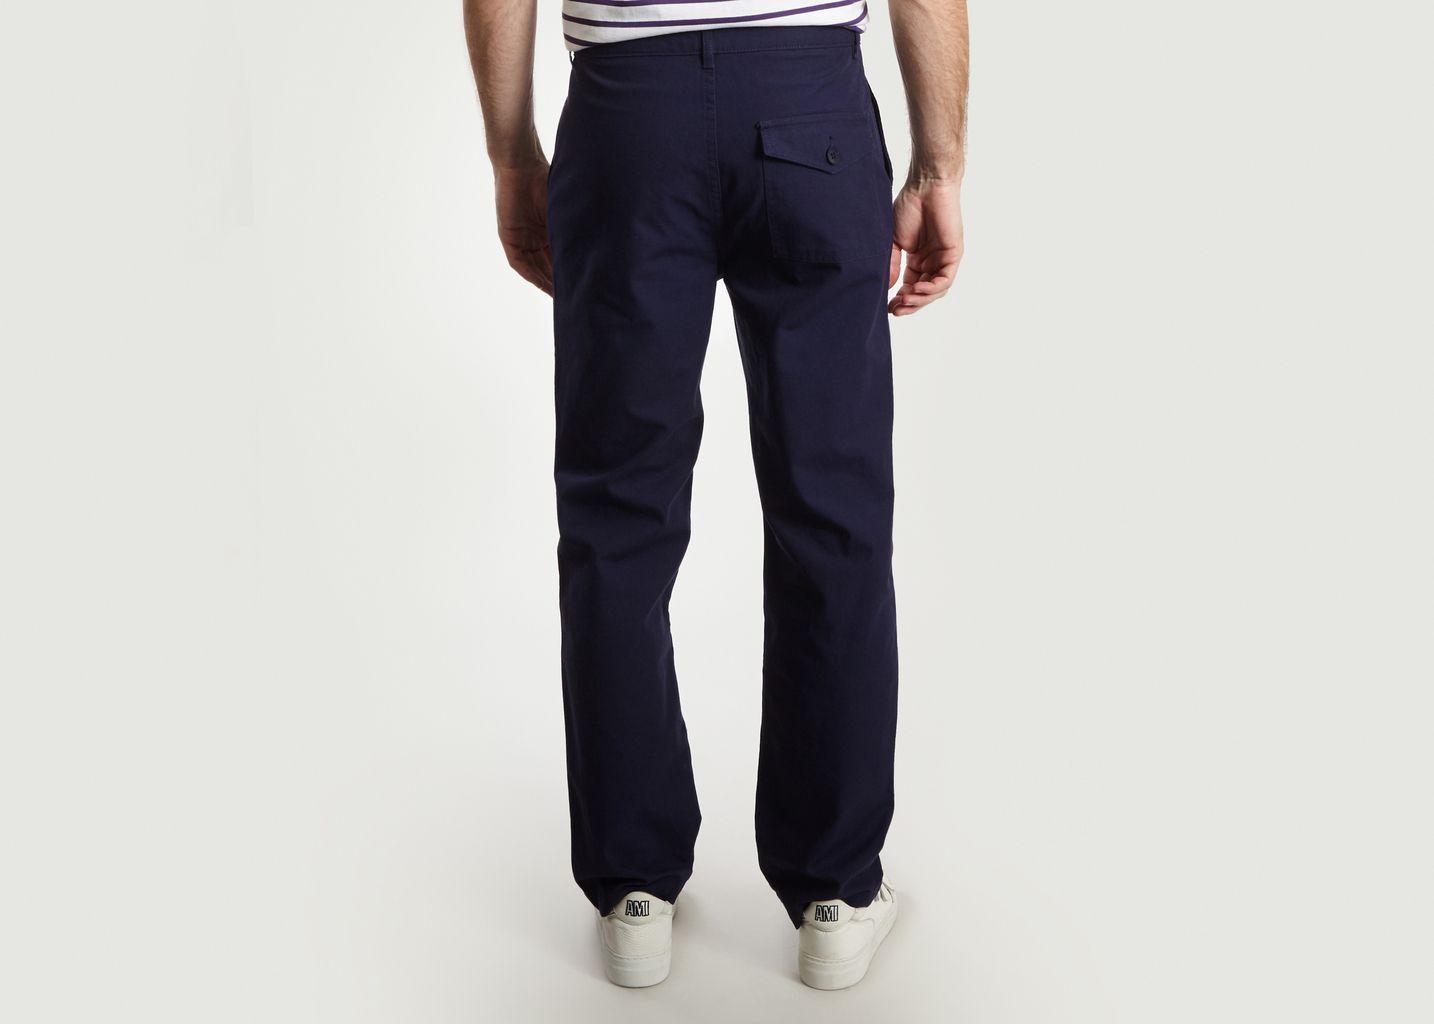 Pantalon Gabare - Armor Lux